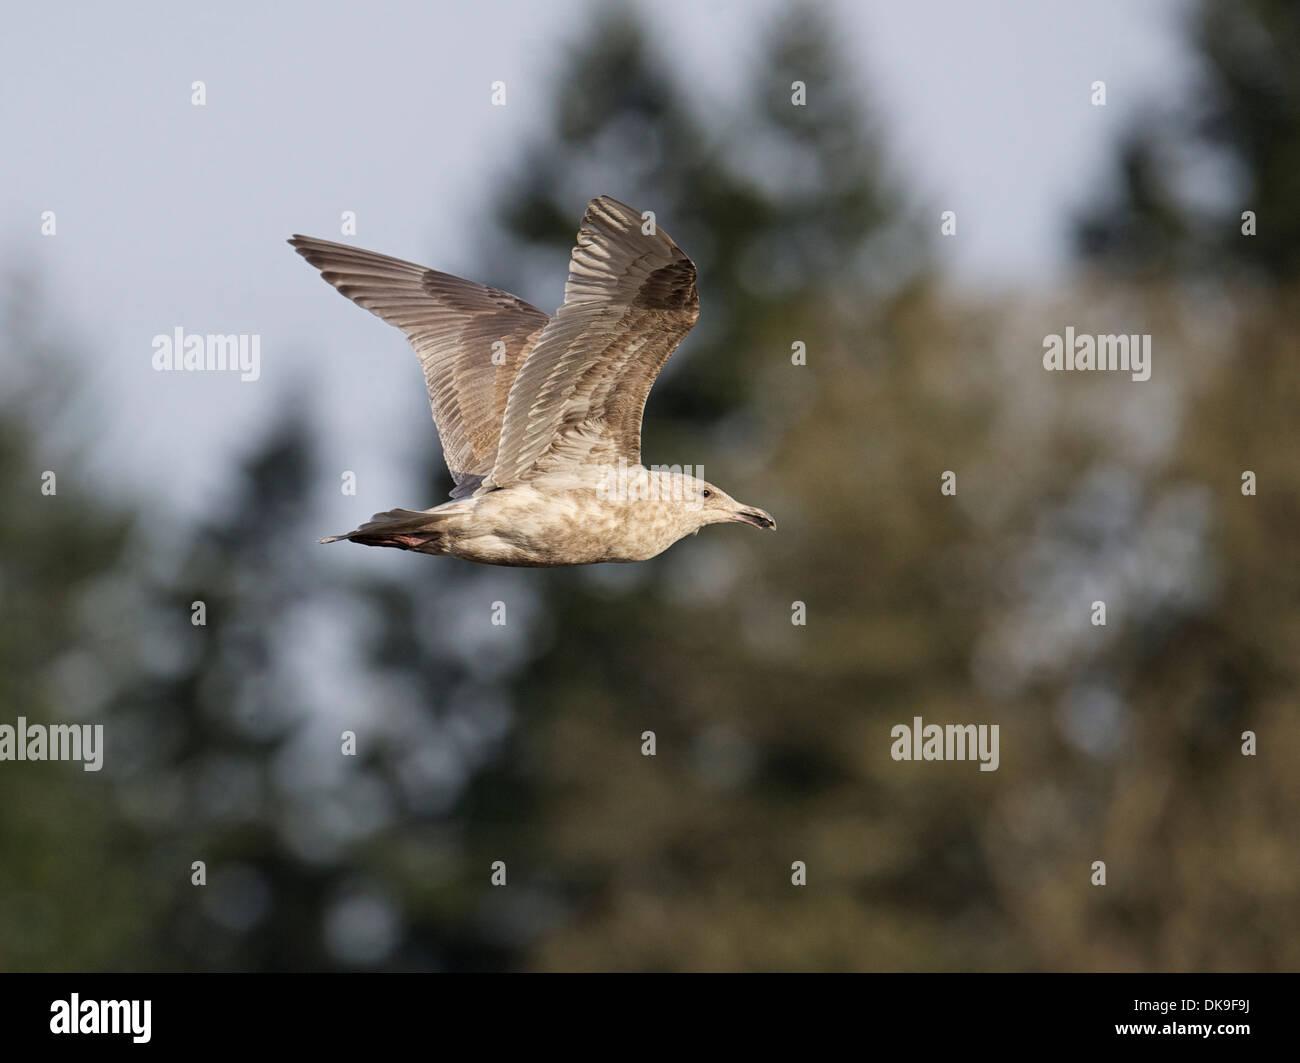 Glaucous-winged Gull (Larus glaucescens) in flight - Stock Image